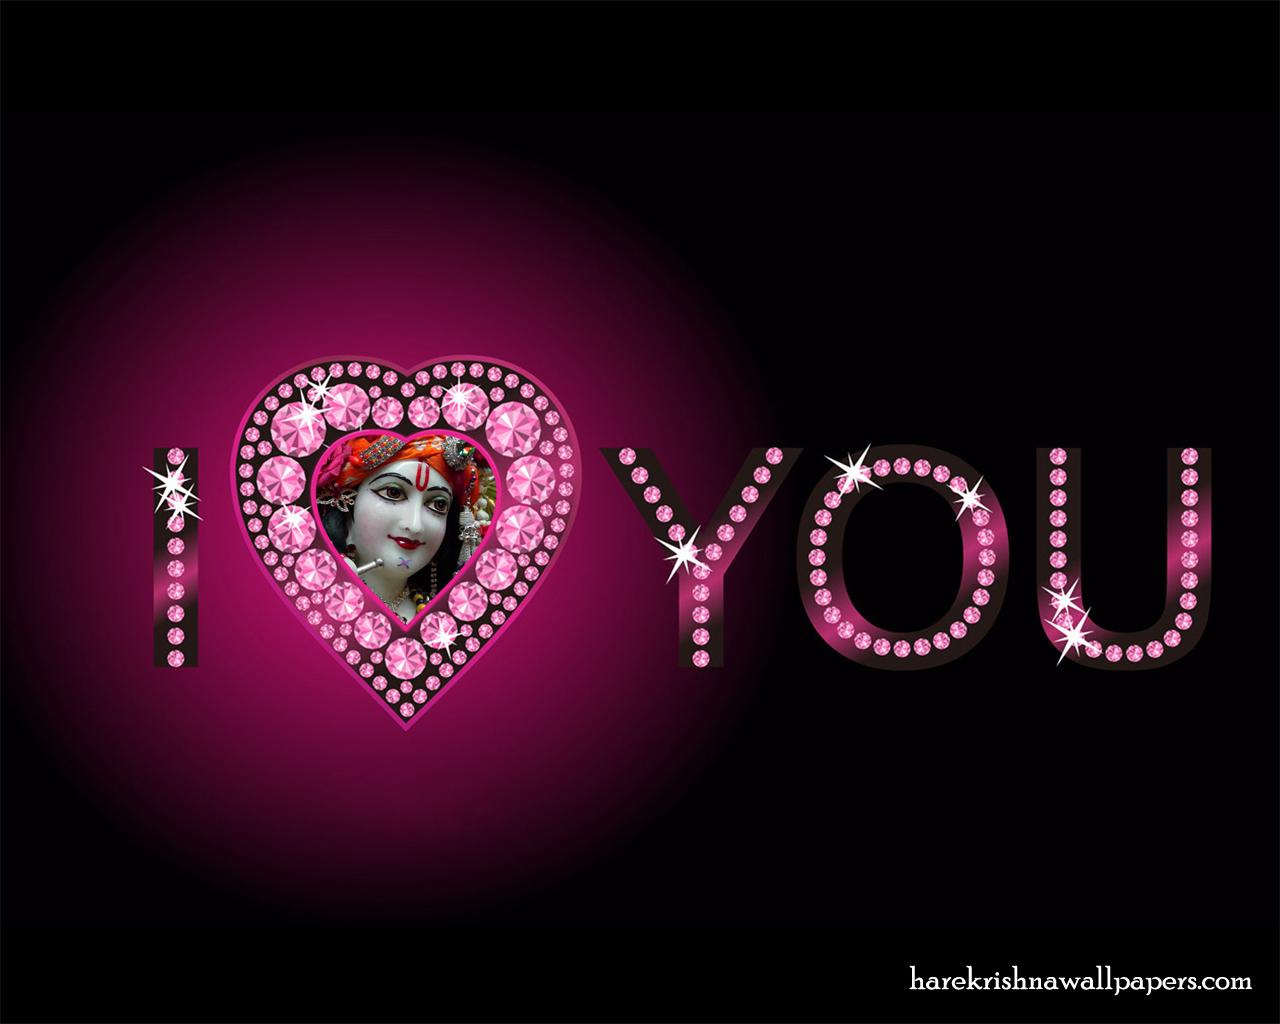 I Love You Giridhari Wallpaper (010) Size 1280x1024 Download